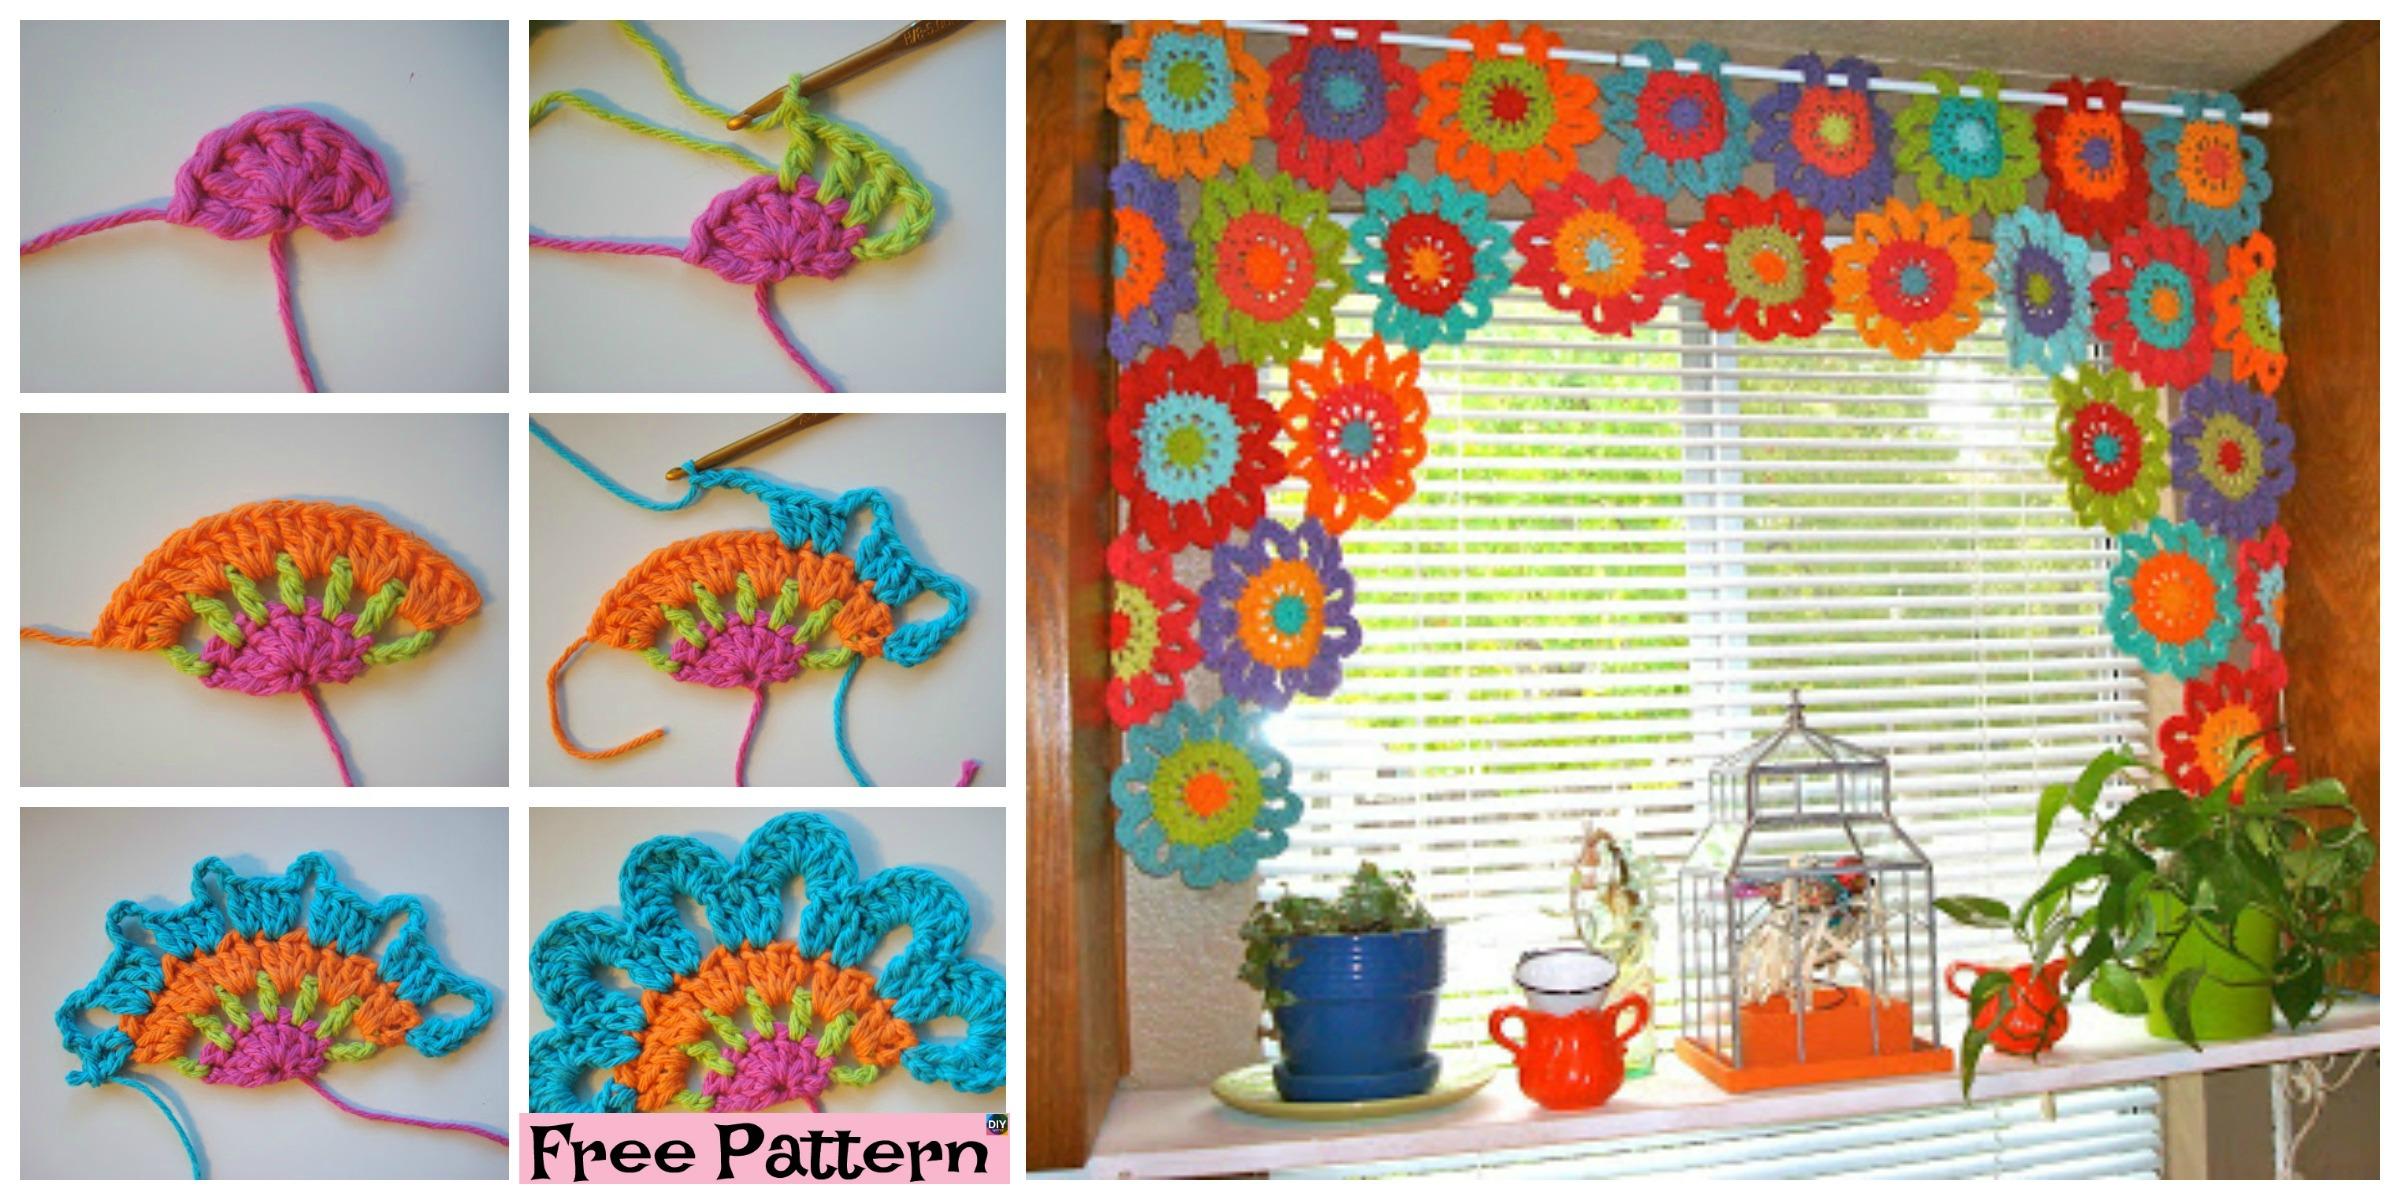 Beautiful Crochet Flower Power Valance - Free Pattern - DIY 4 EVER